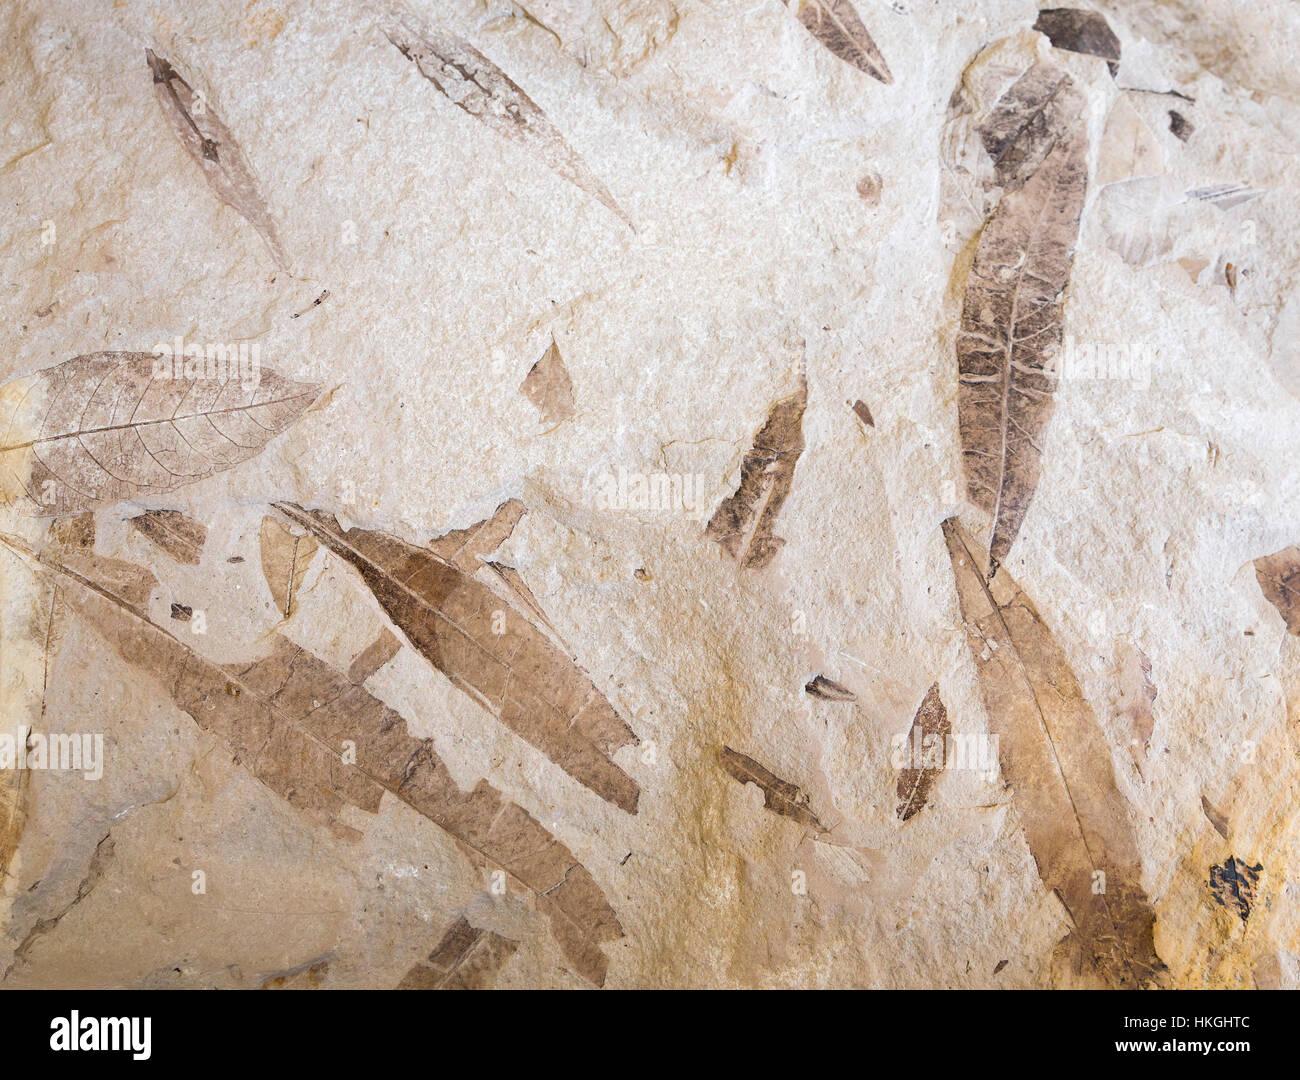 Hoja fósil en piedra. Registro fósil de las antiguas plantas muertas. Textura paleontológico huella Imagen De Stock